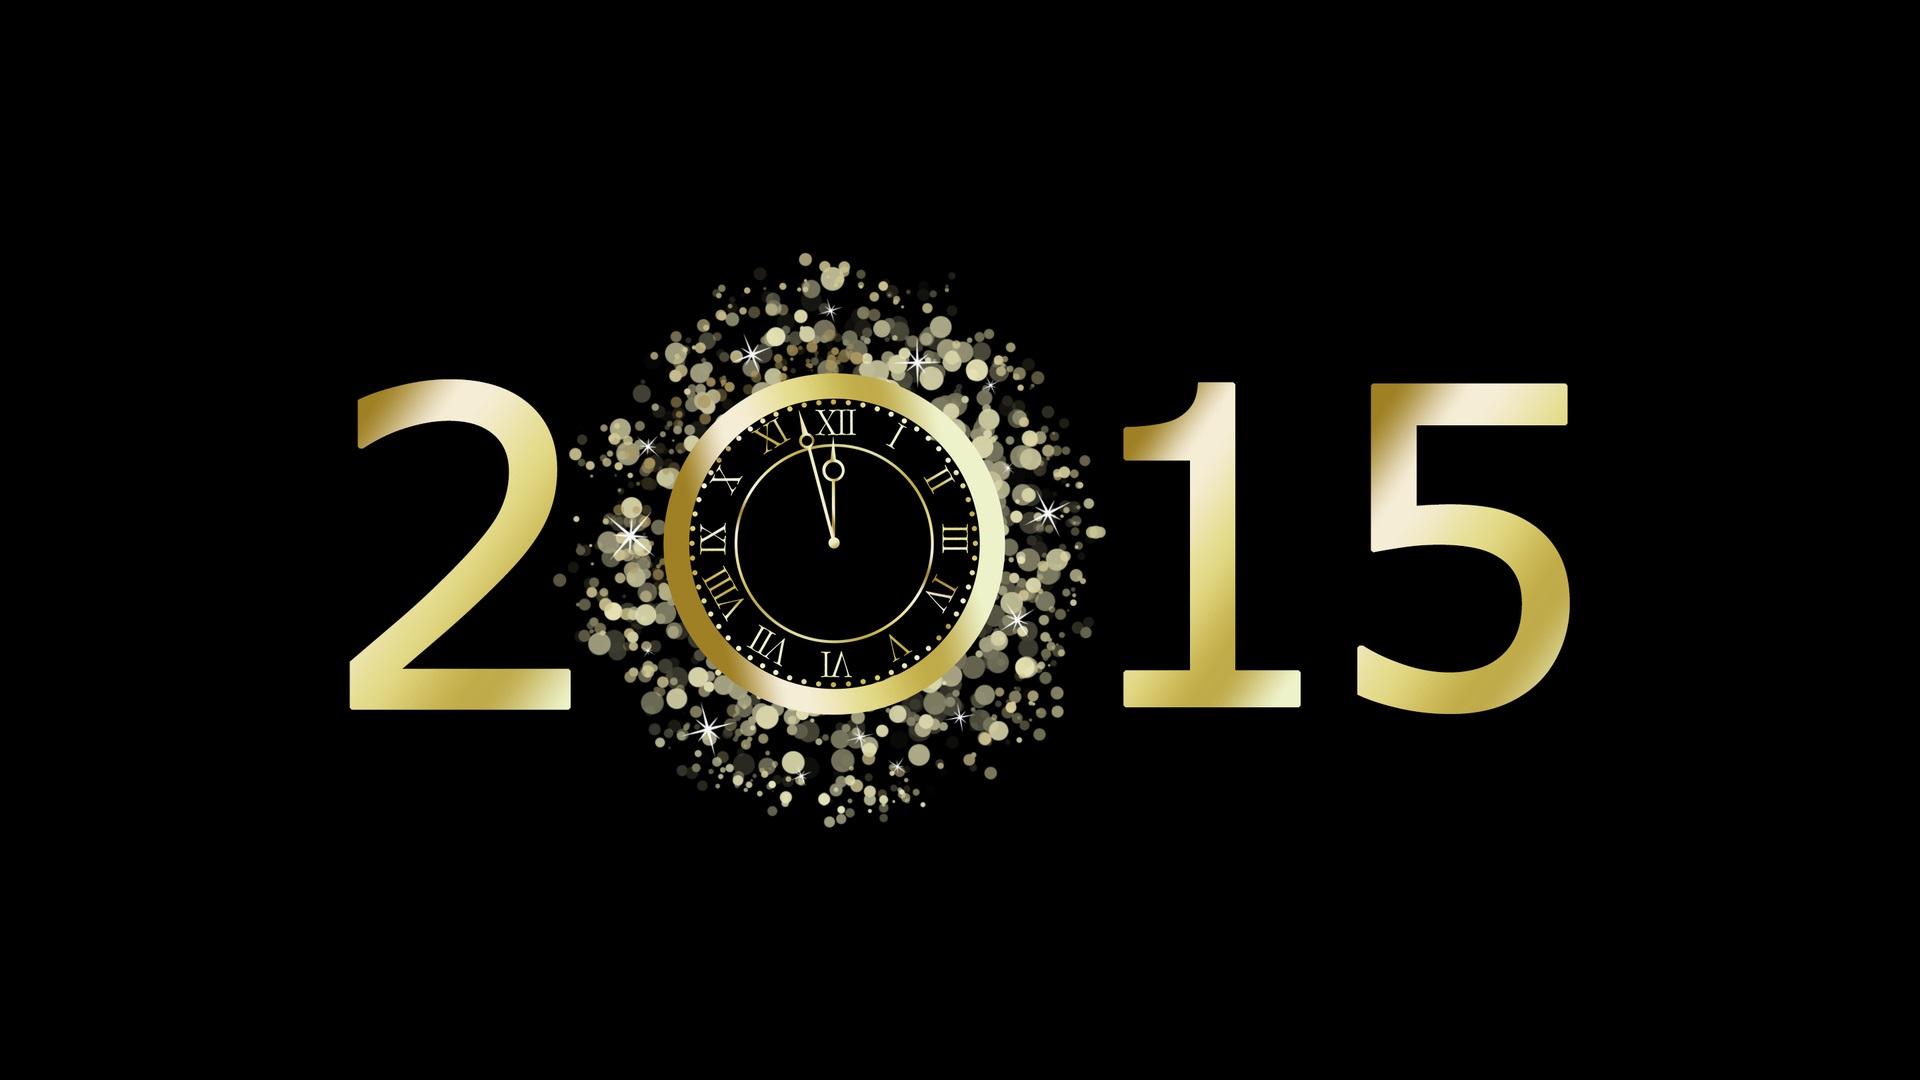 Chinese Zodiac Horoscope 2015 Hd Wallpapers 1920x1080